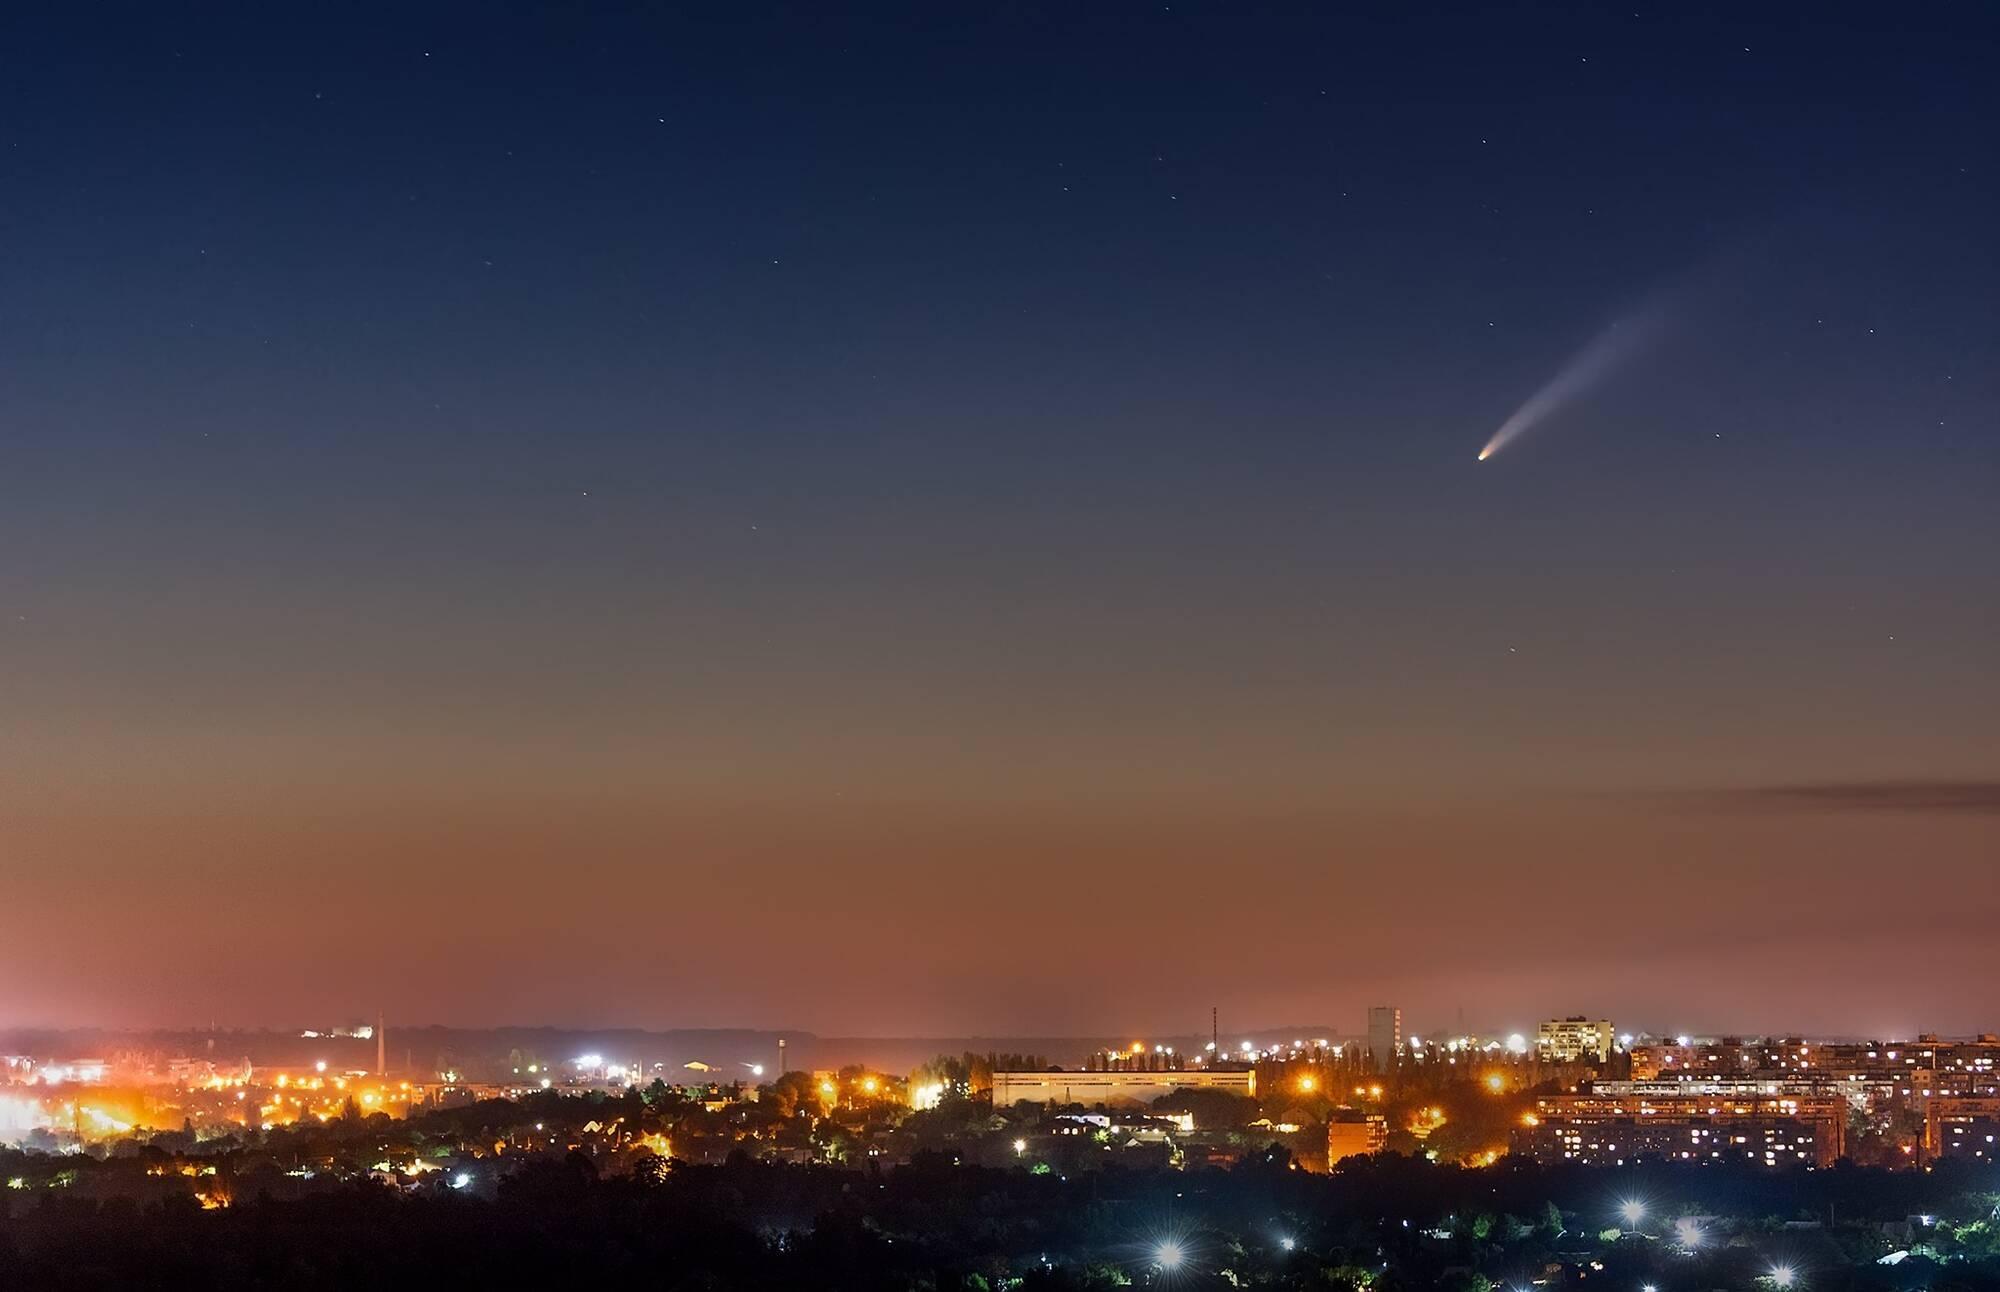 Комета C/2020 F3 над Запоріжжям